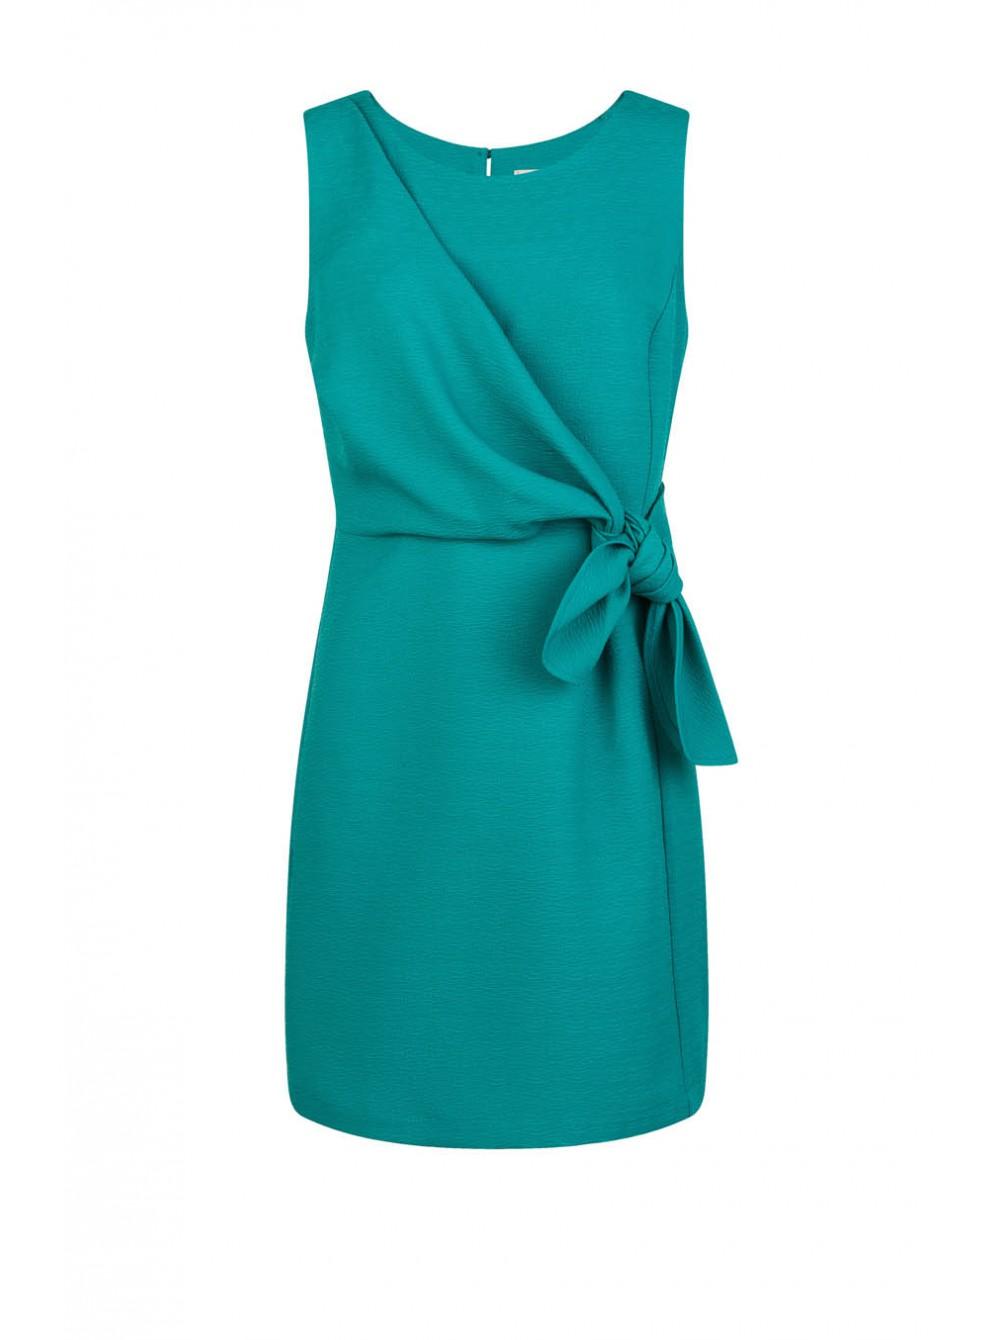 Robe invitee mariage turquoise